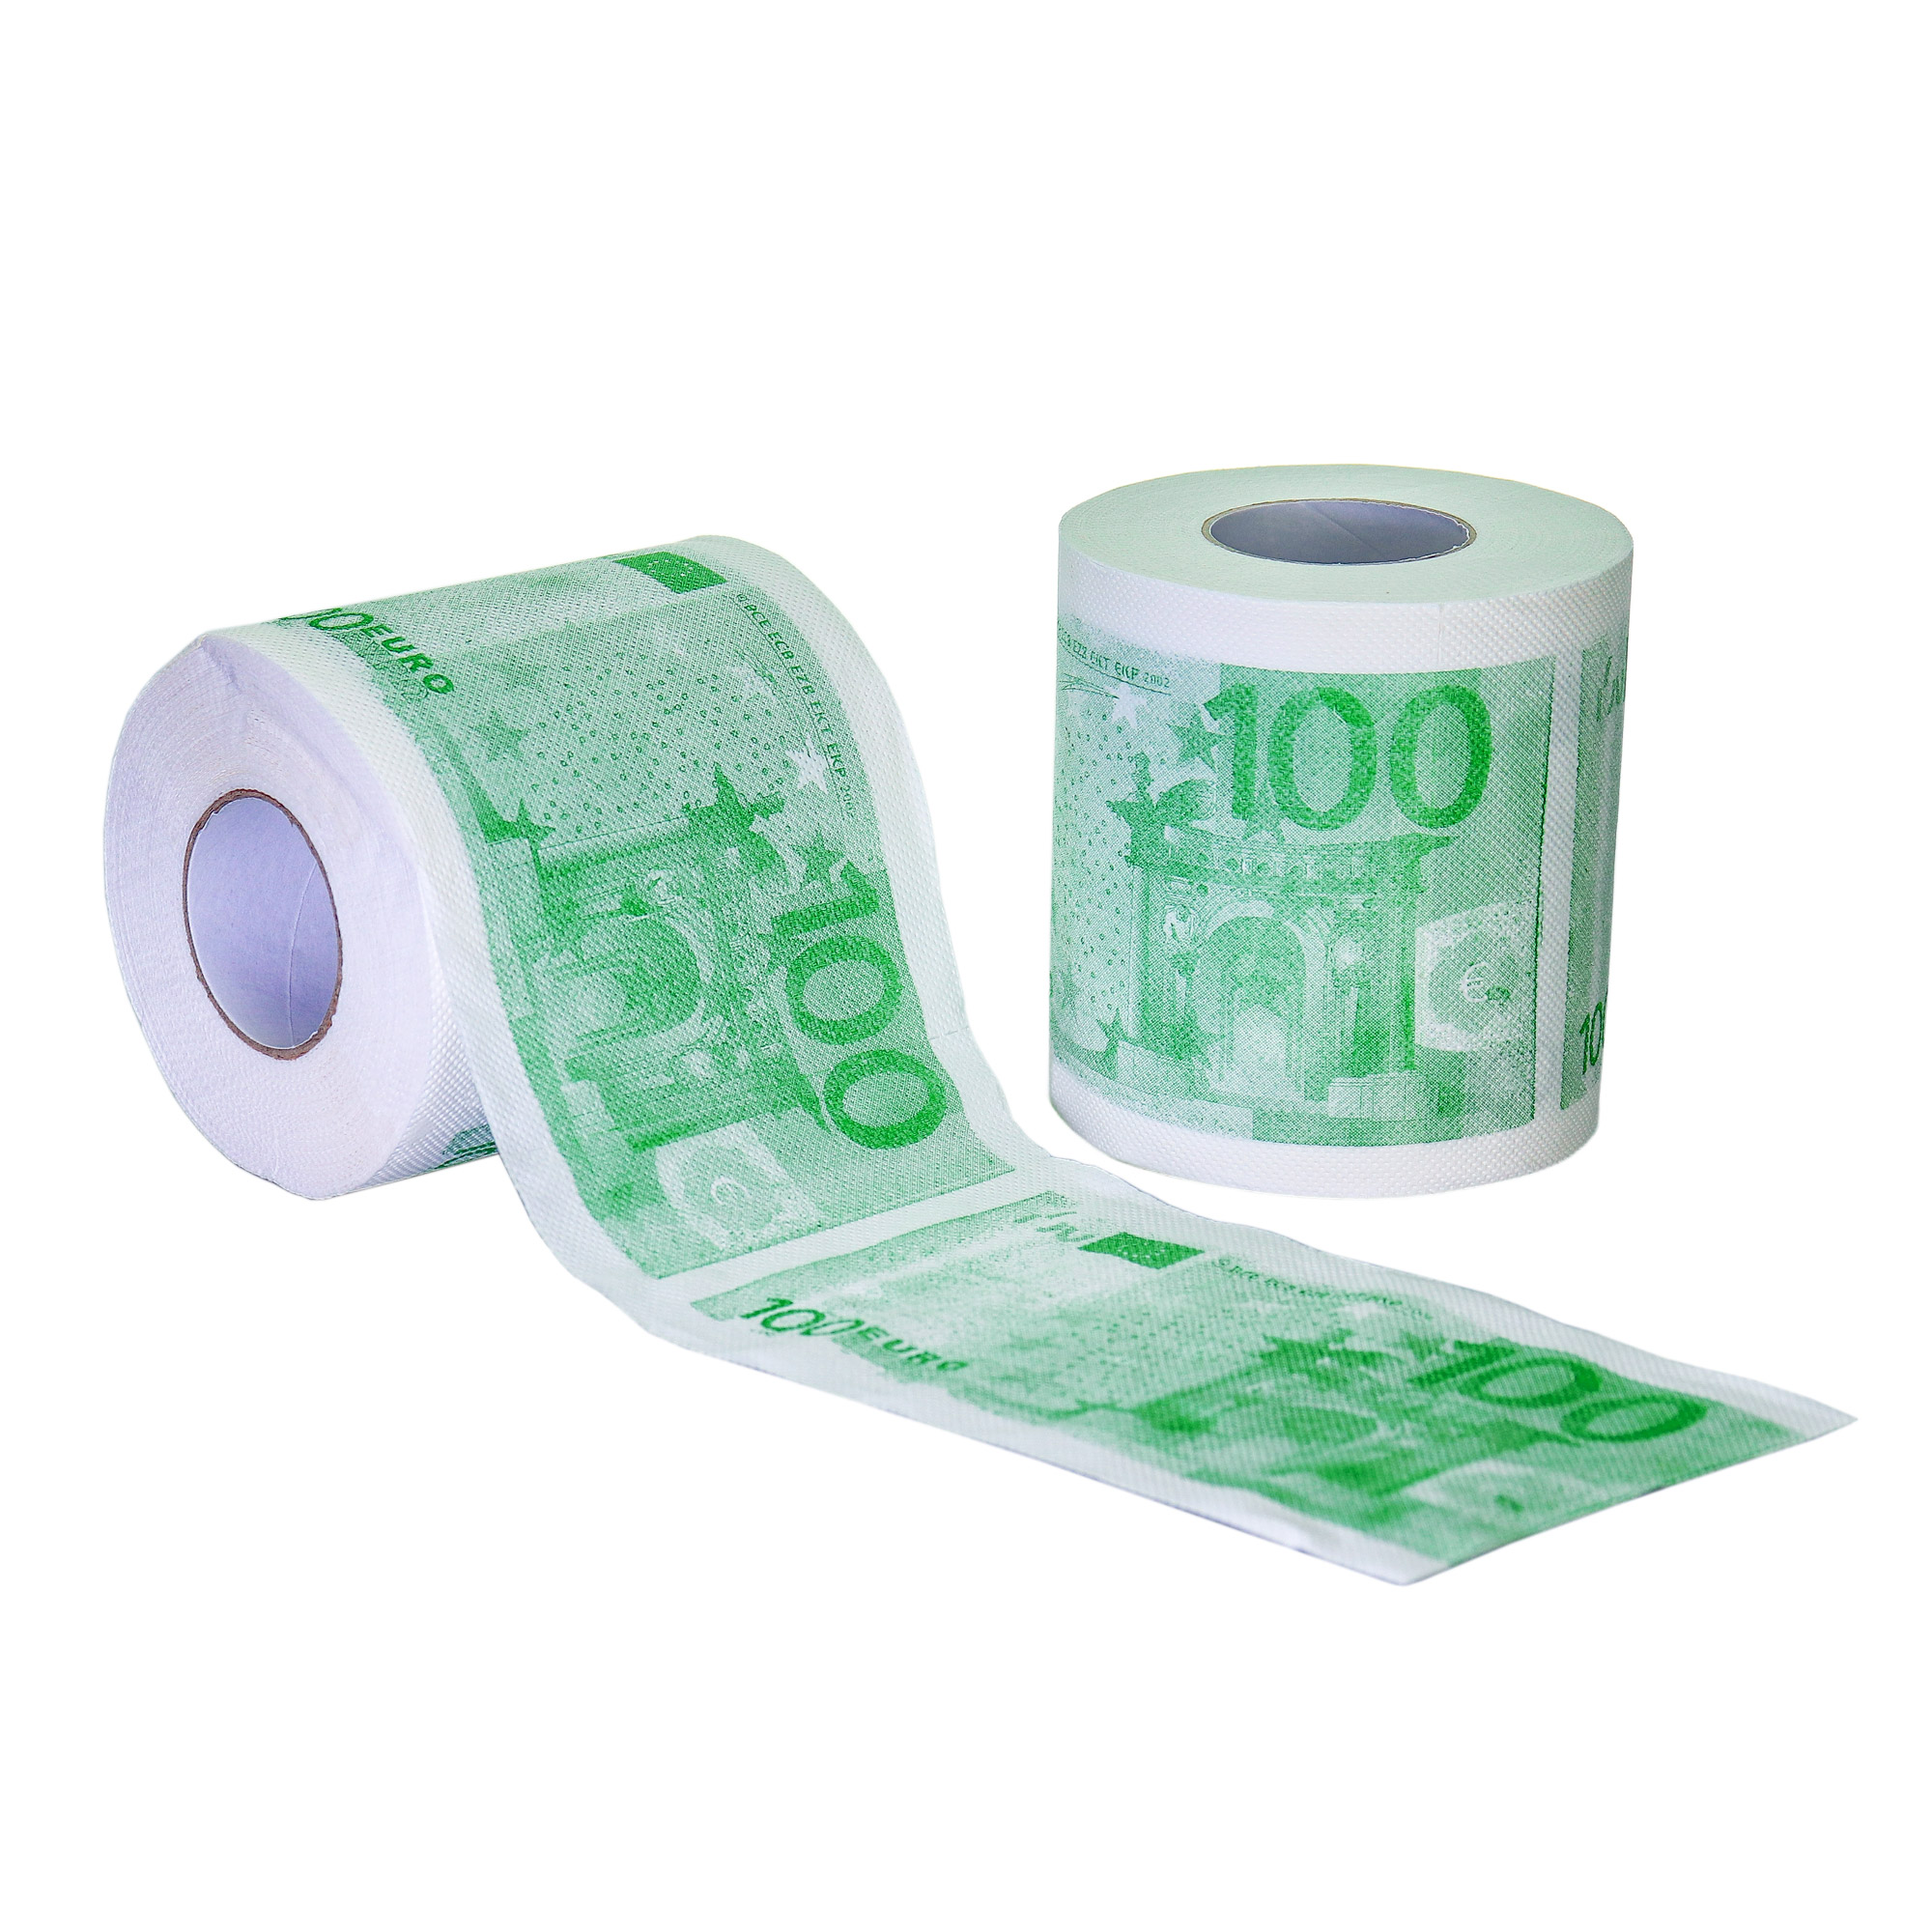 Geld Toilettenpapier - 2